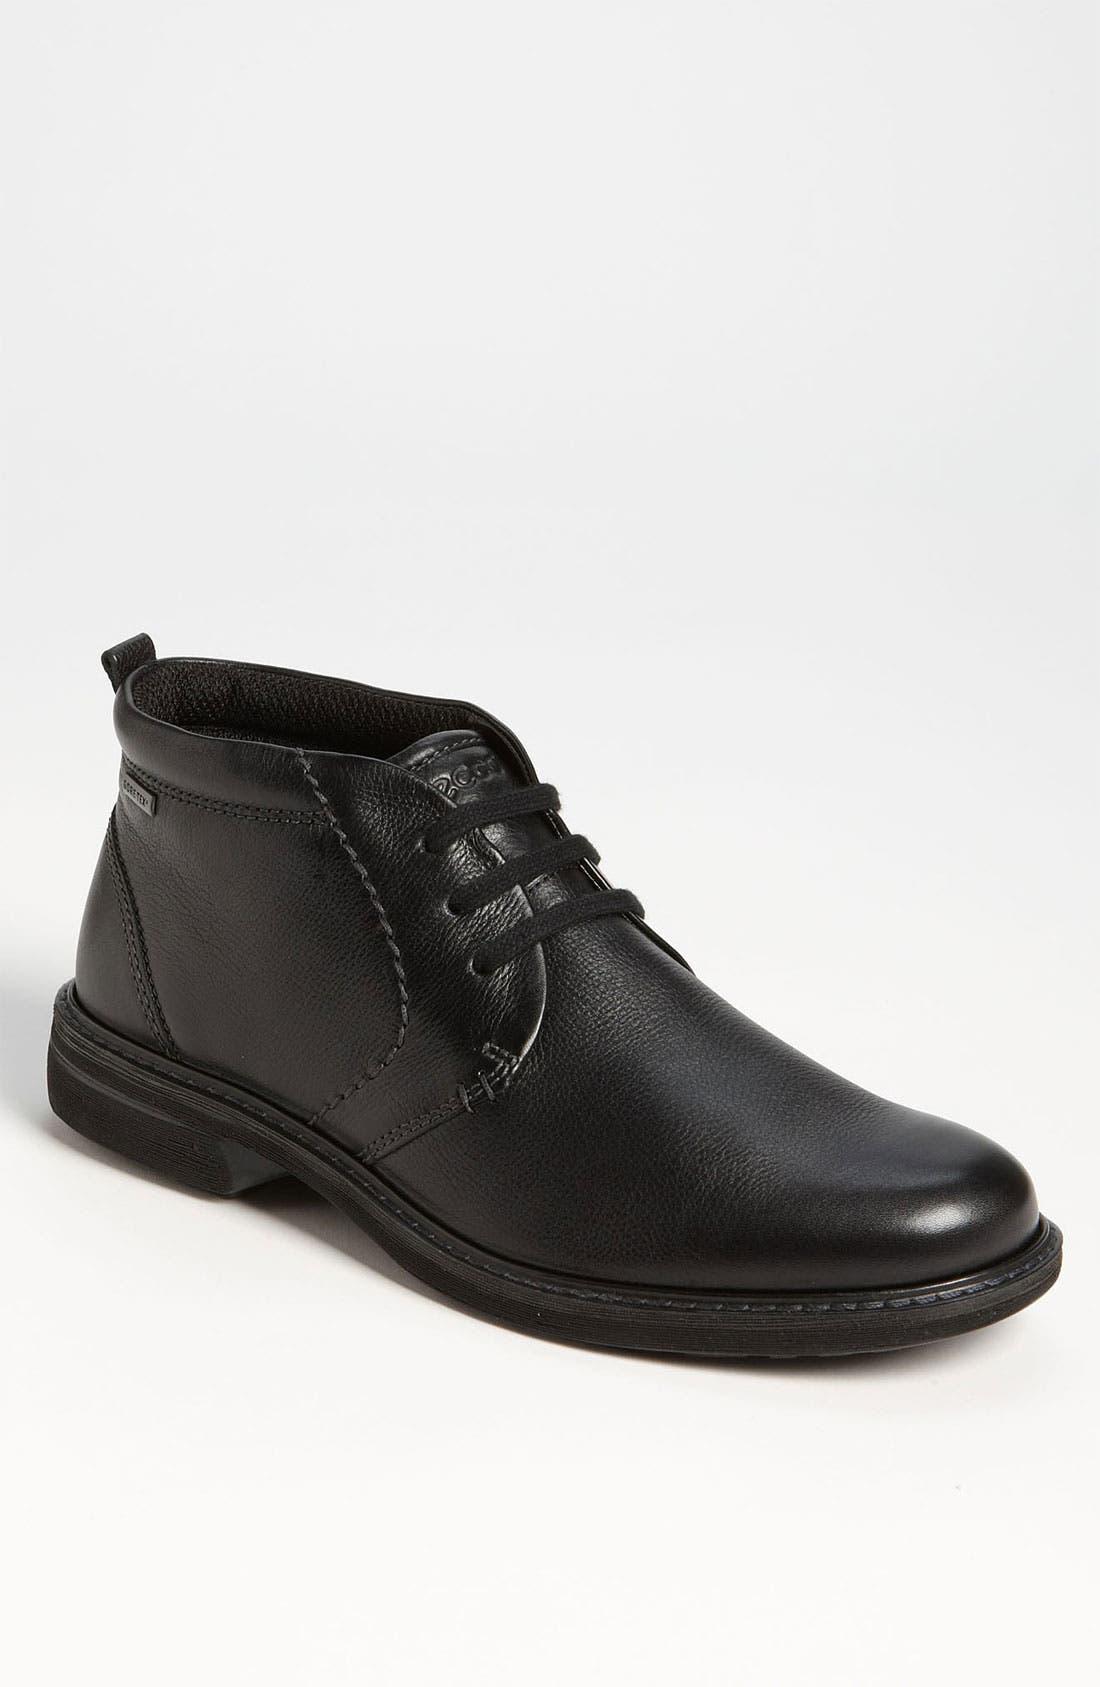 Alternate Image 1 Selected - ECCO 'Turn' Chukka Boot (Men)